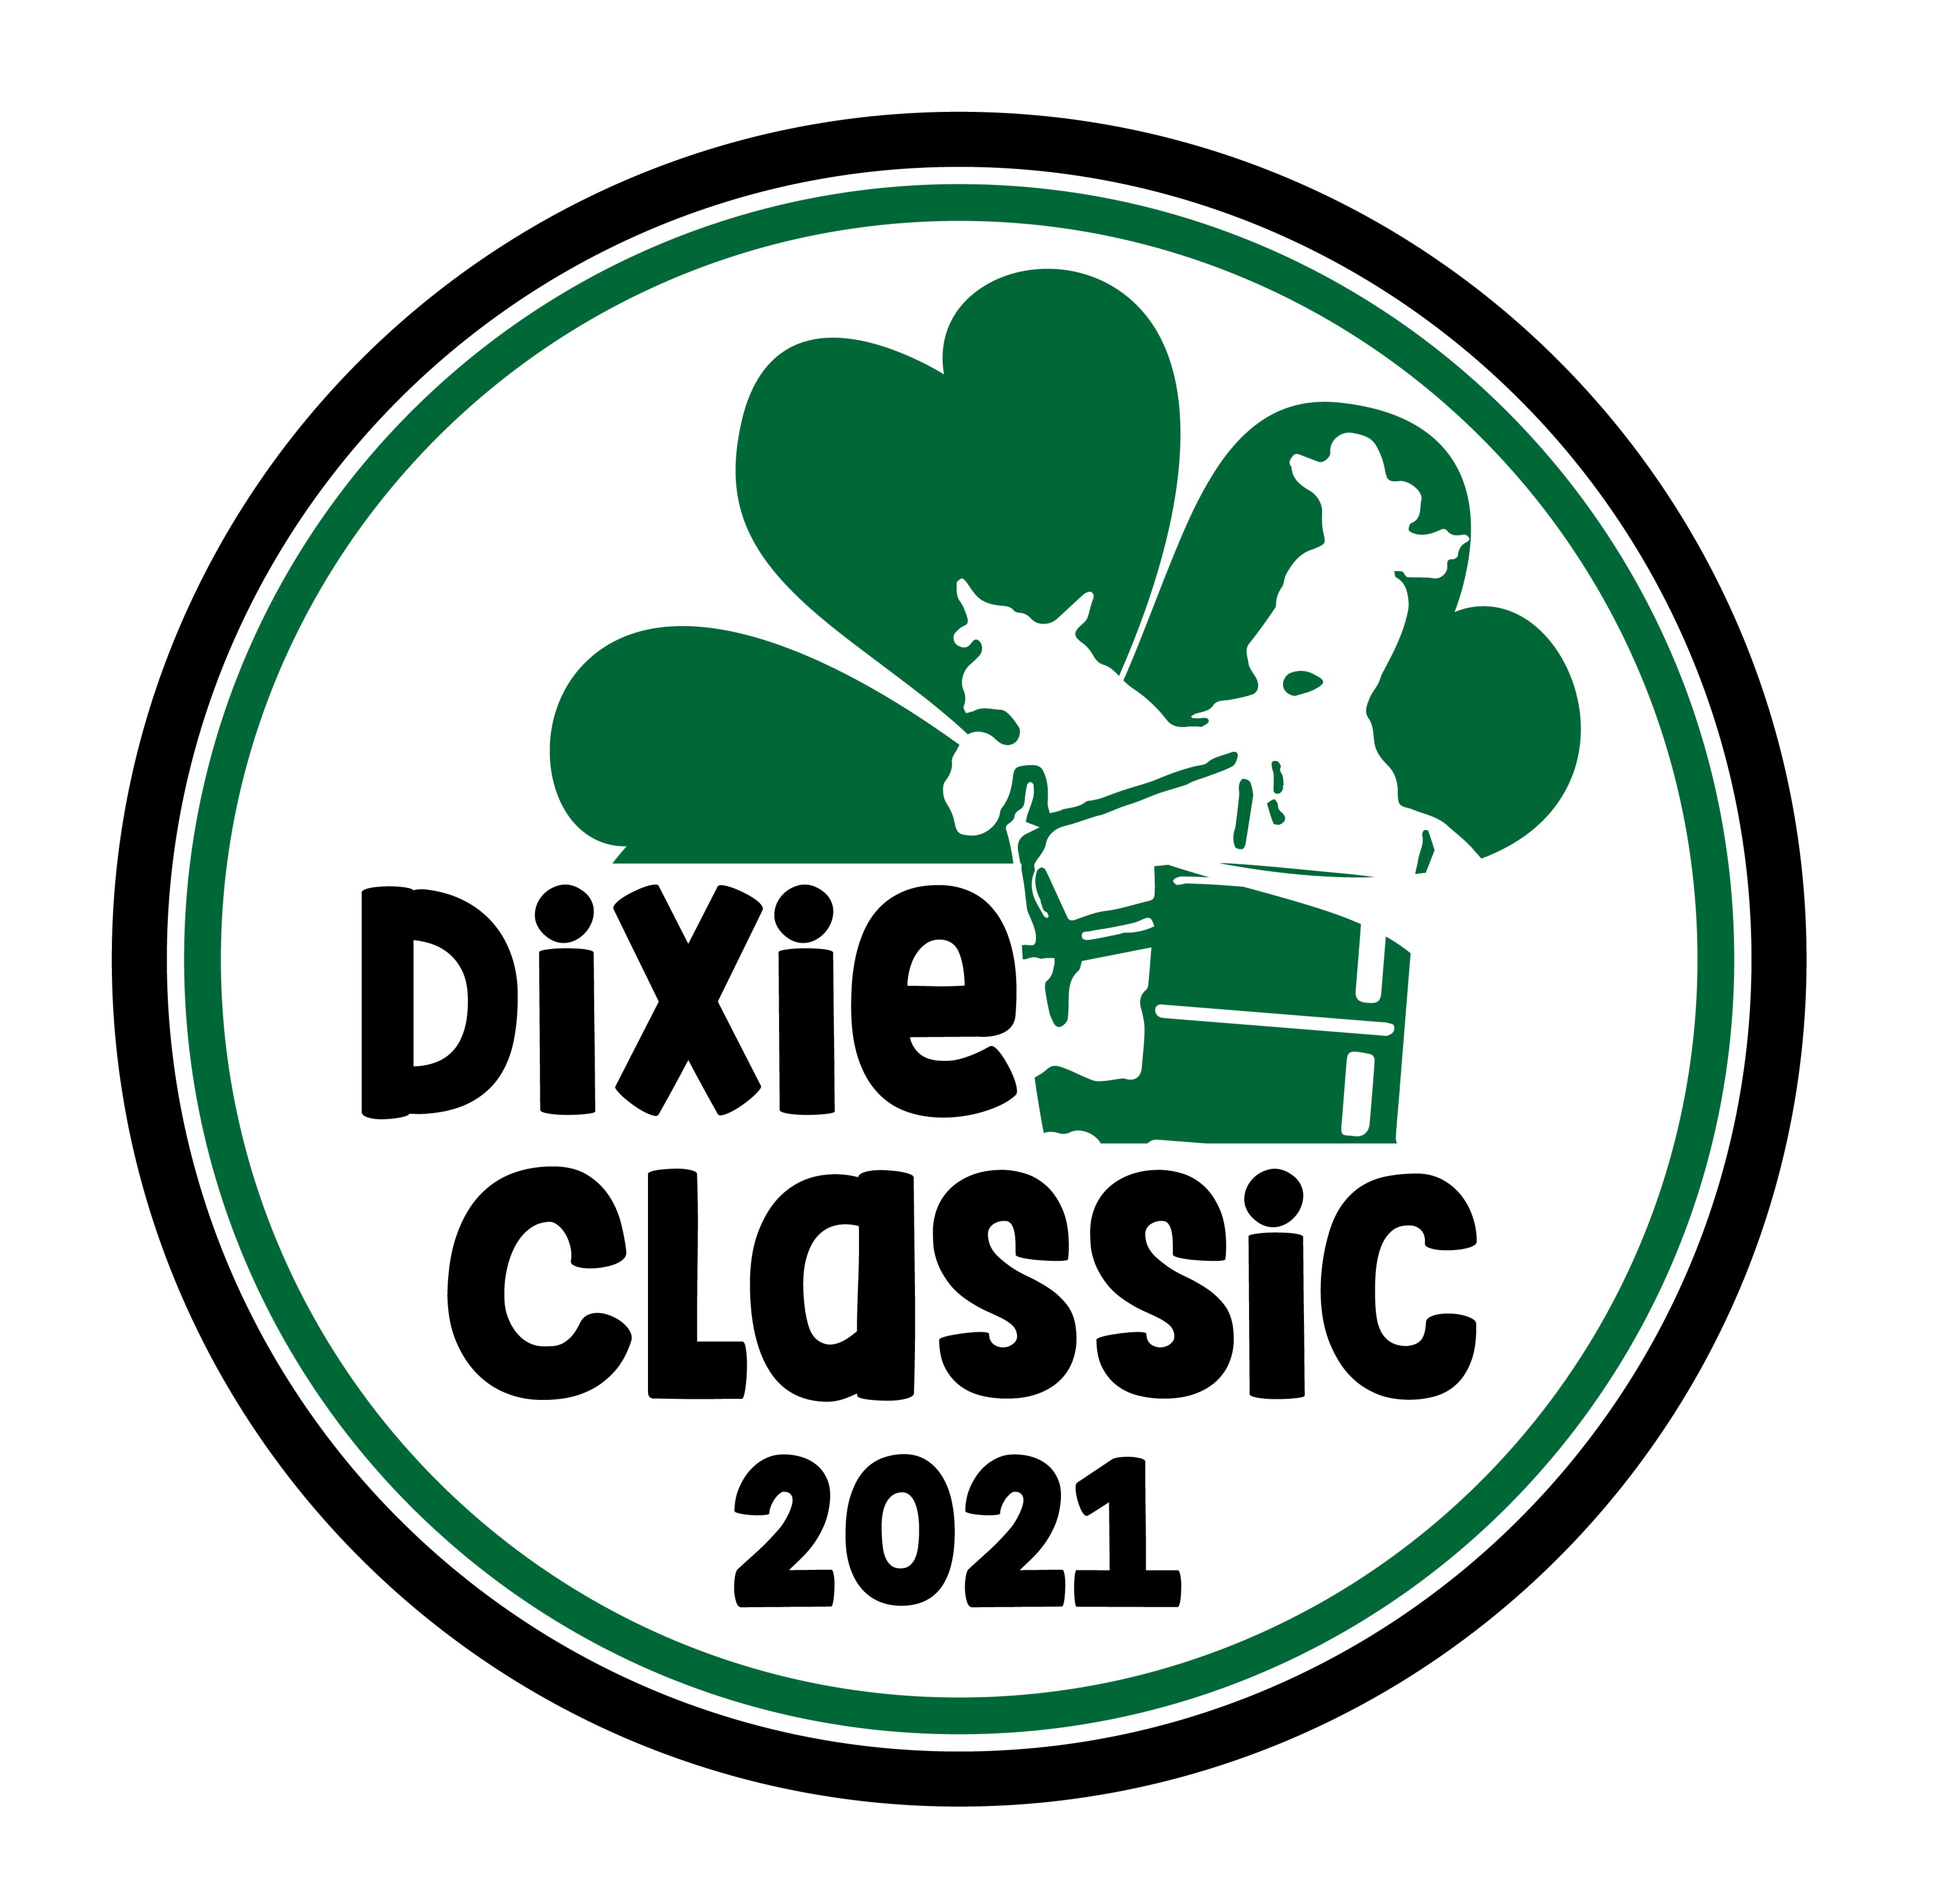 Dixie Classic Futurity 2021